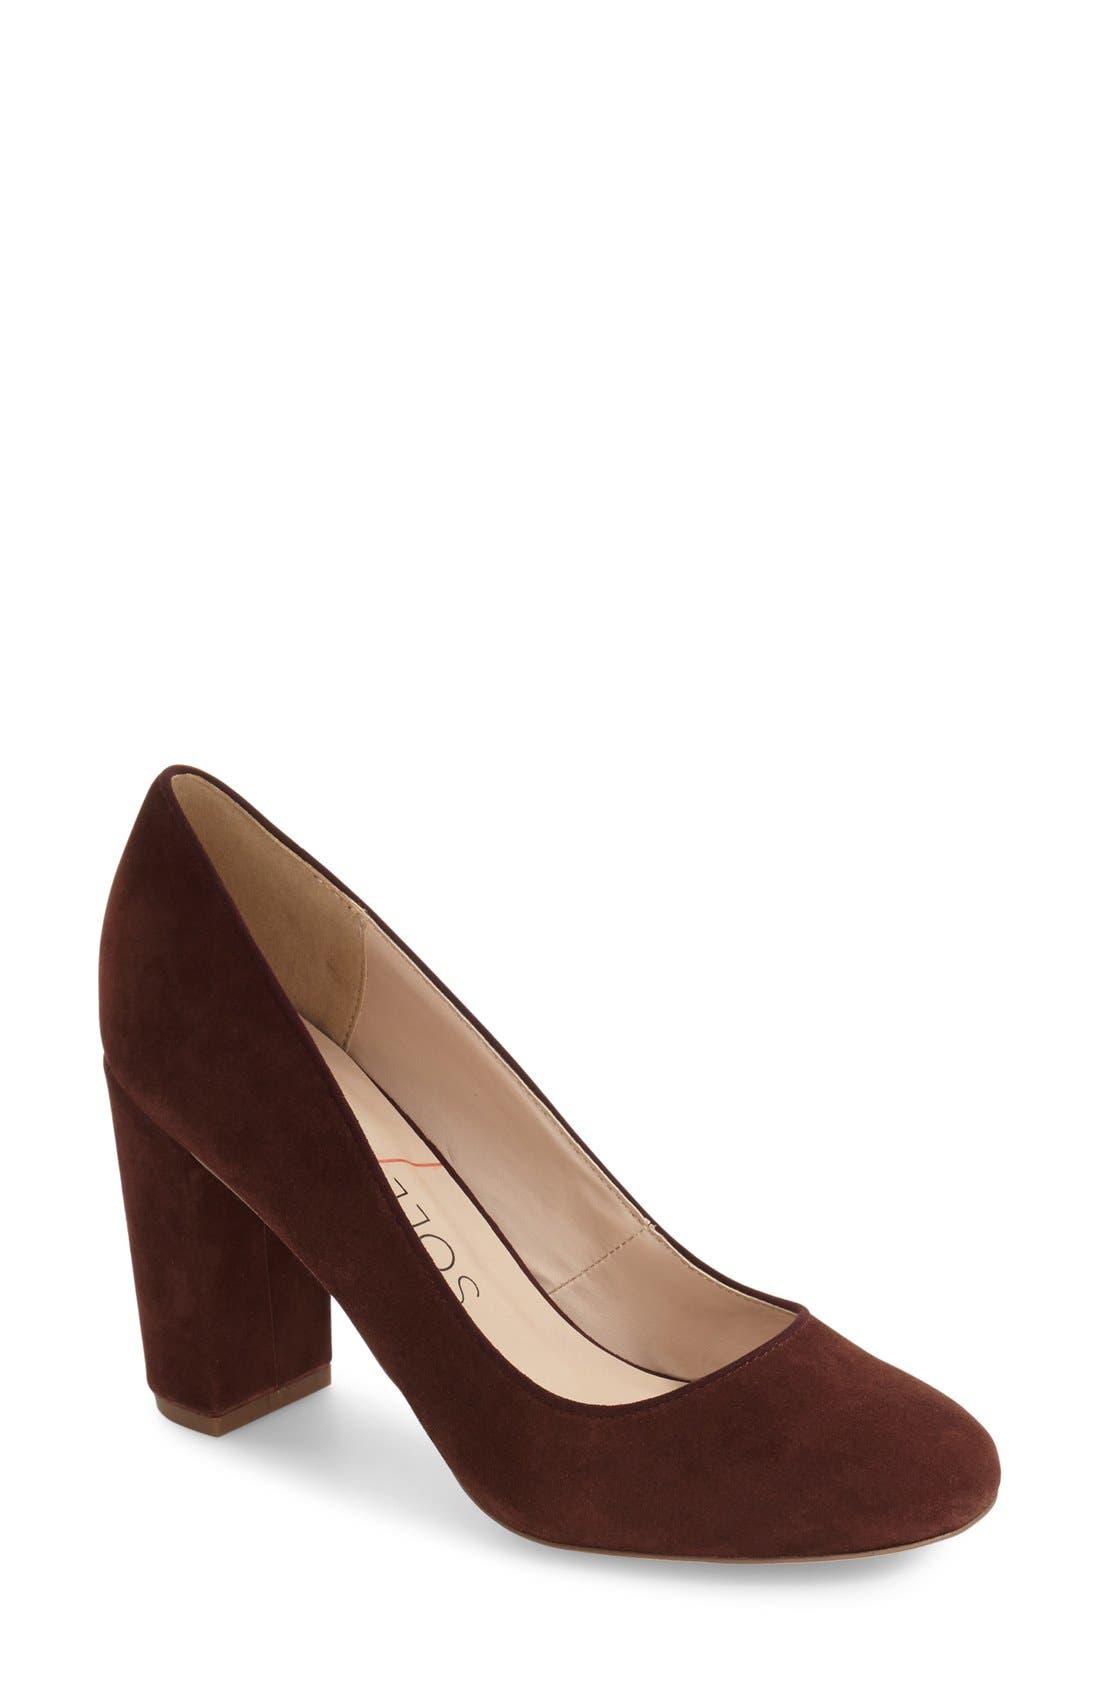 Main Image - Sole Society Giselle Block Heel Pump (Women)